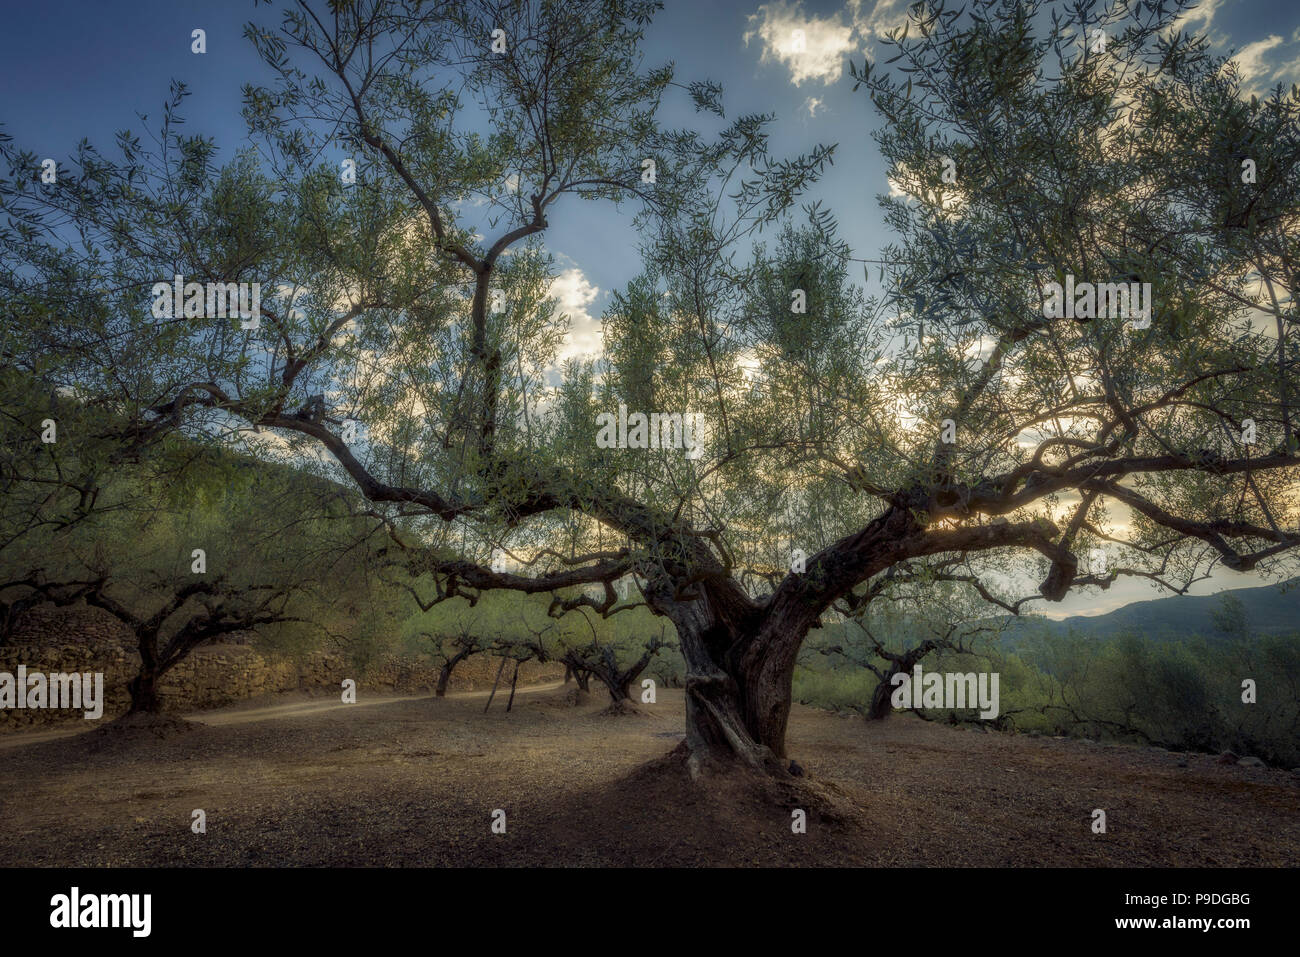 Olive trees in La Vall d'Almonacid (Castellon - Spain) Stock Photo